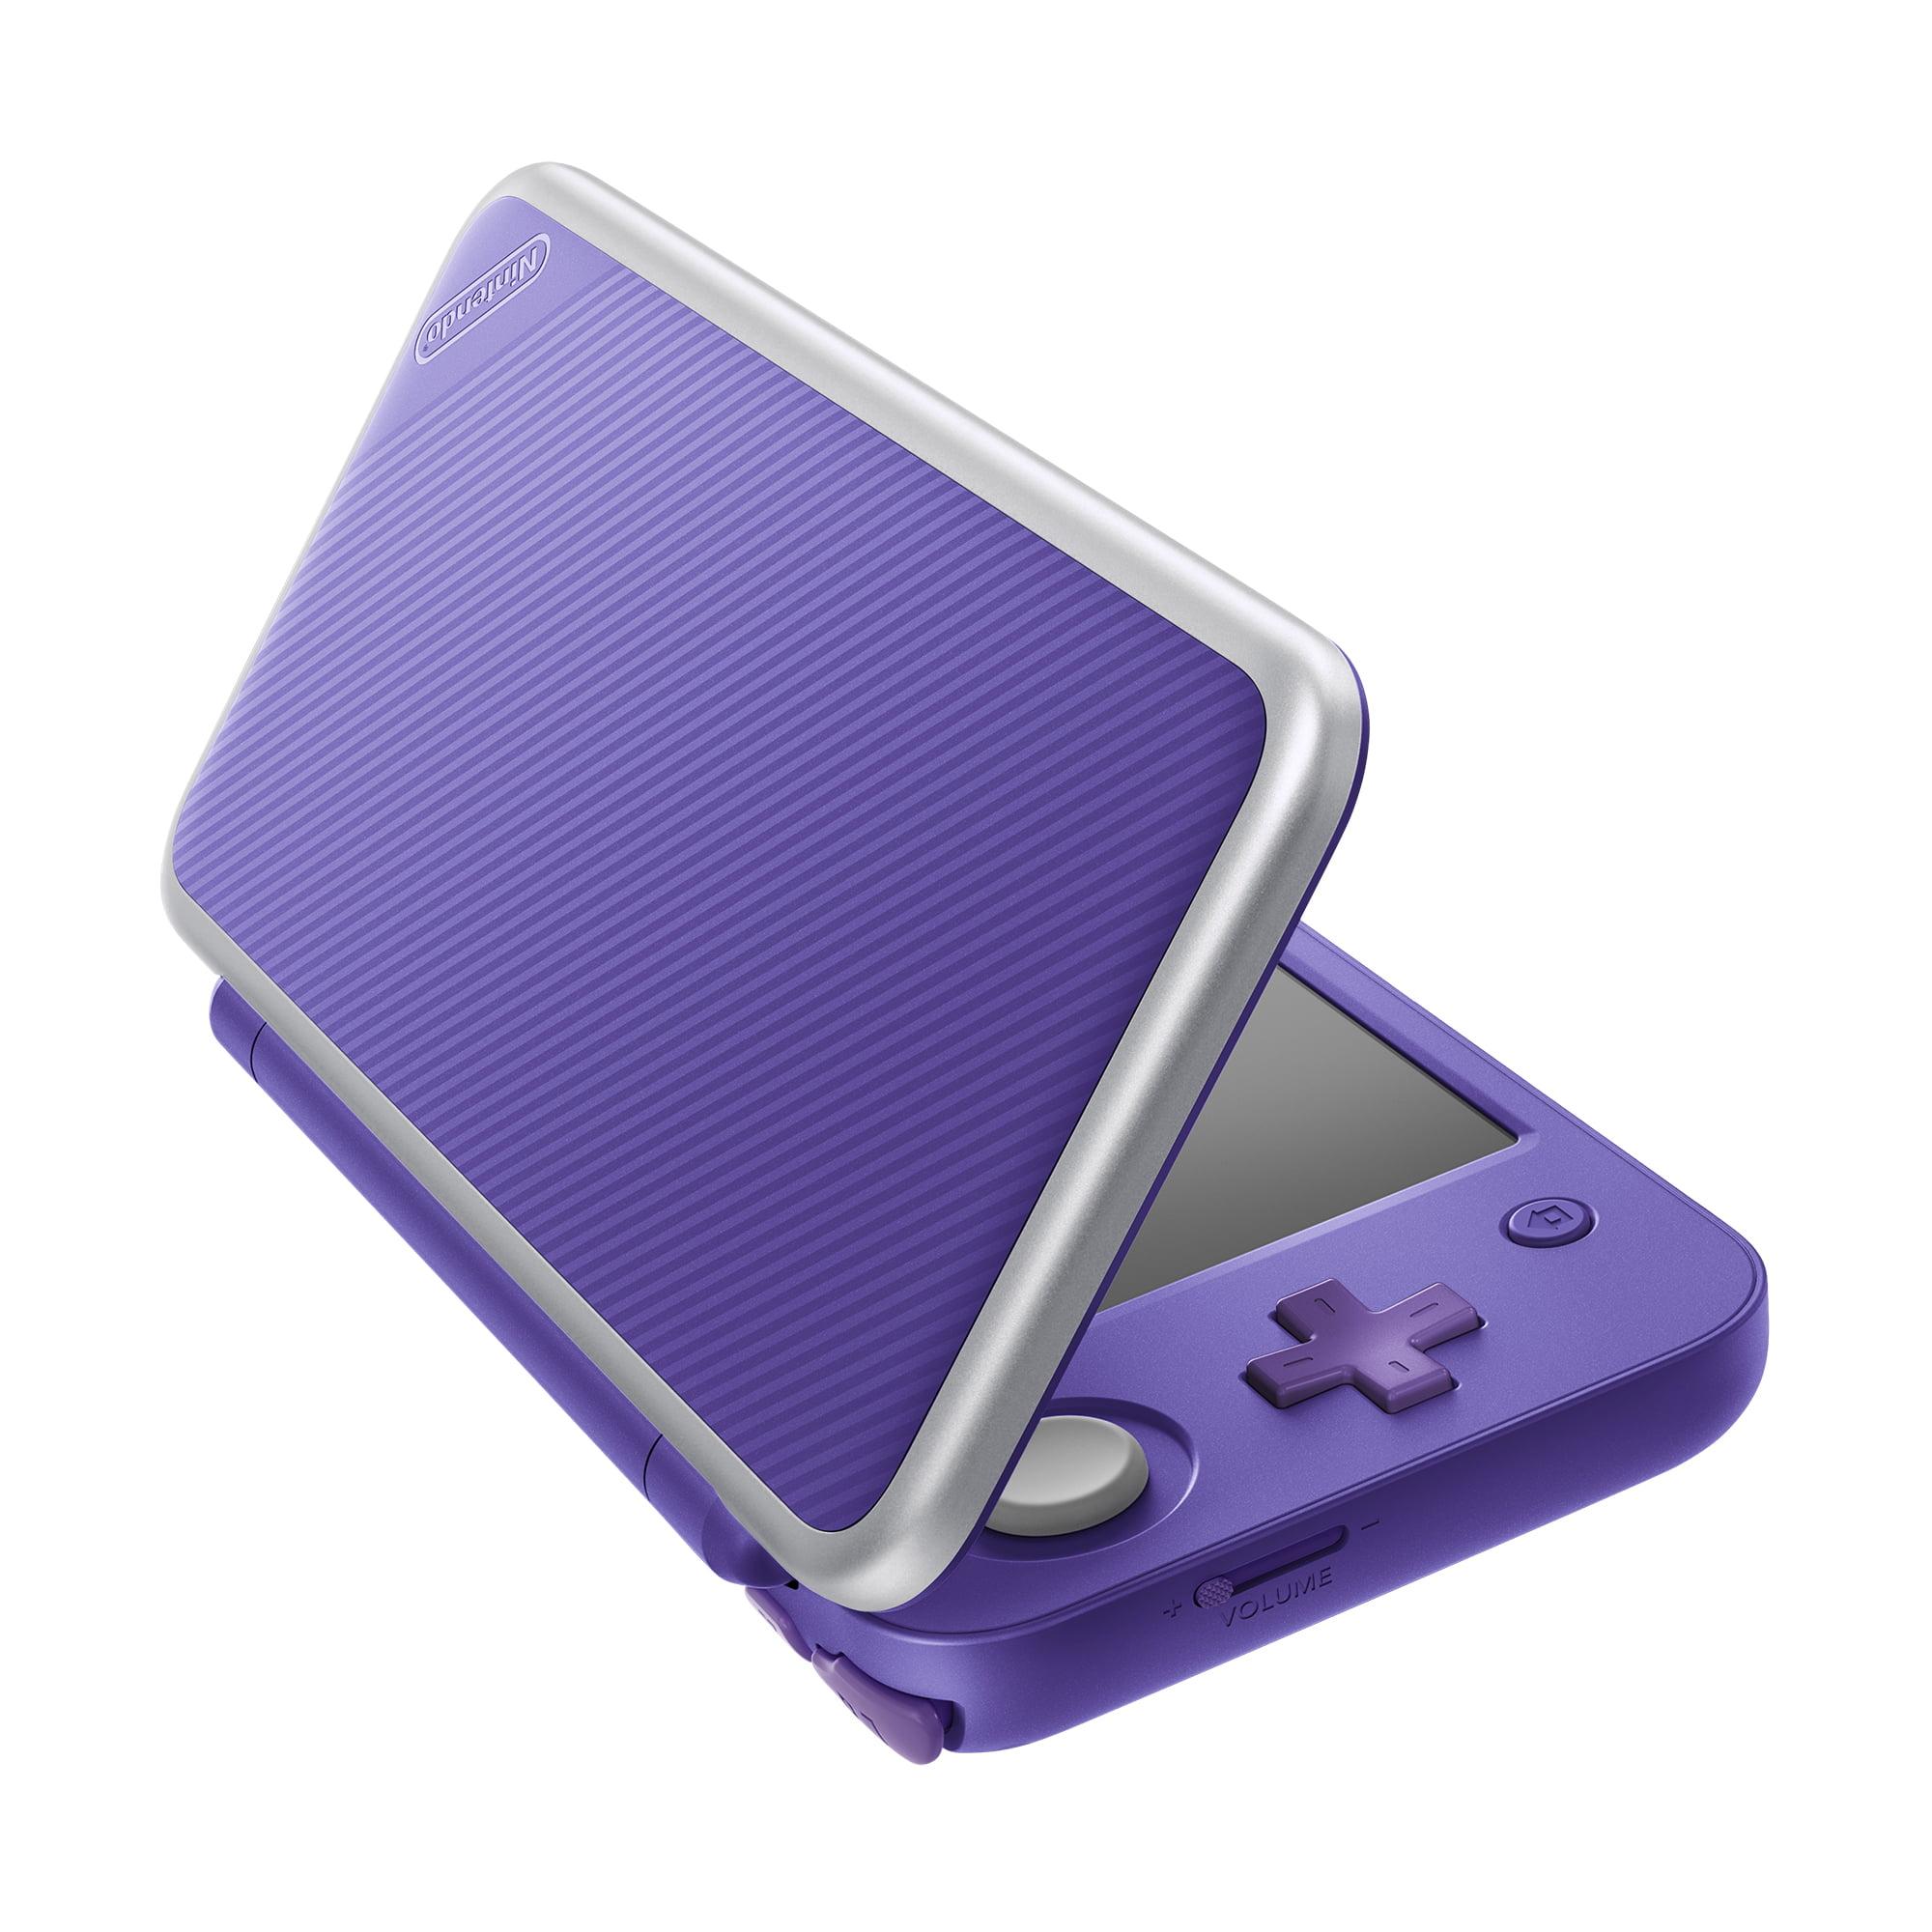 New Nintendo 2ds Xl System W Mario Kart 7 Pre Installed Purple